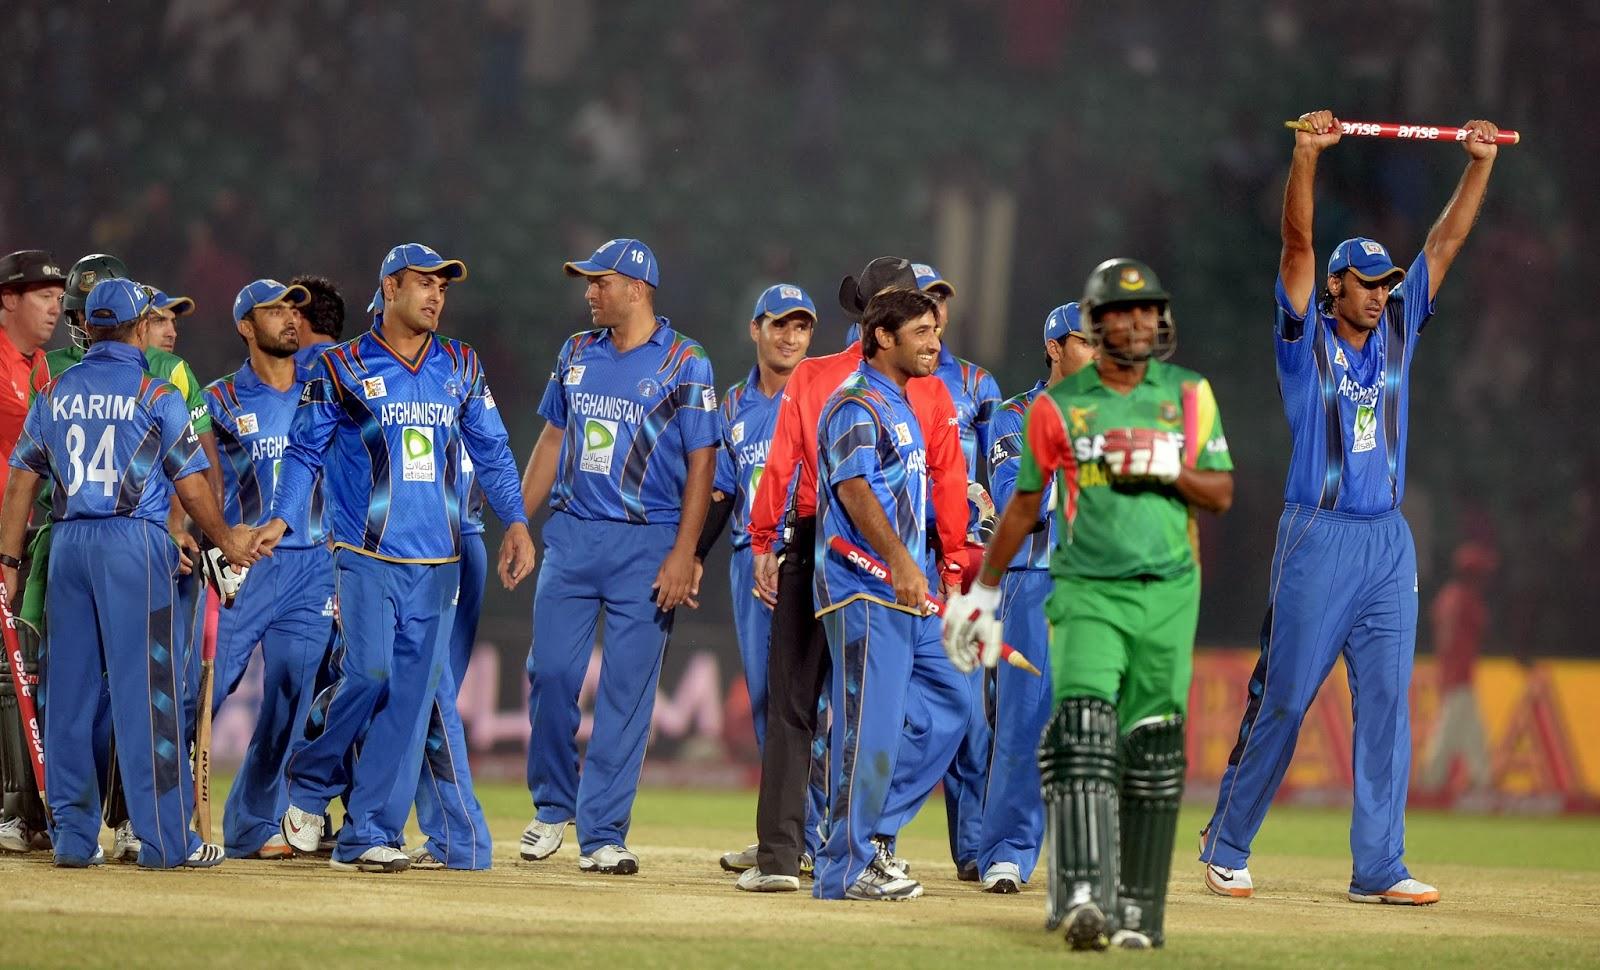 5th Match, ACC, Afghanistan, Afghanistan vs Bangladesh, Asia Cup, Asia Cup 2014, Bangladesh, Captain, Cricket, History, Mohammad Nabi, Mushfiqur Rahim, Sports, Test Team, Victory, Winner, Ziaur Rahman